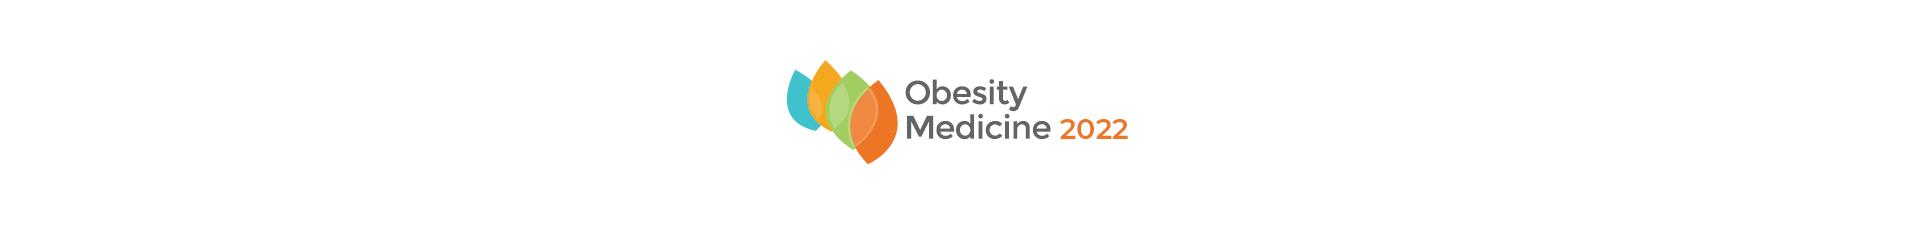 Obesity Medicine 2022 Event Banner